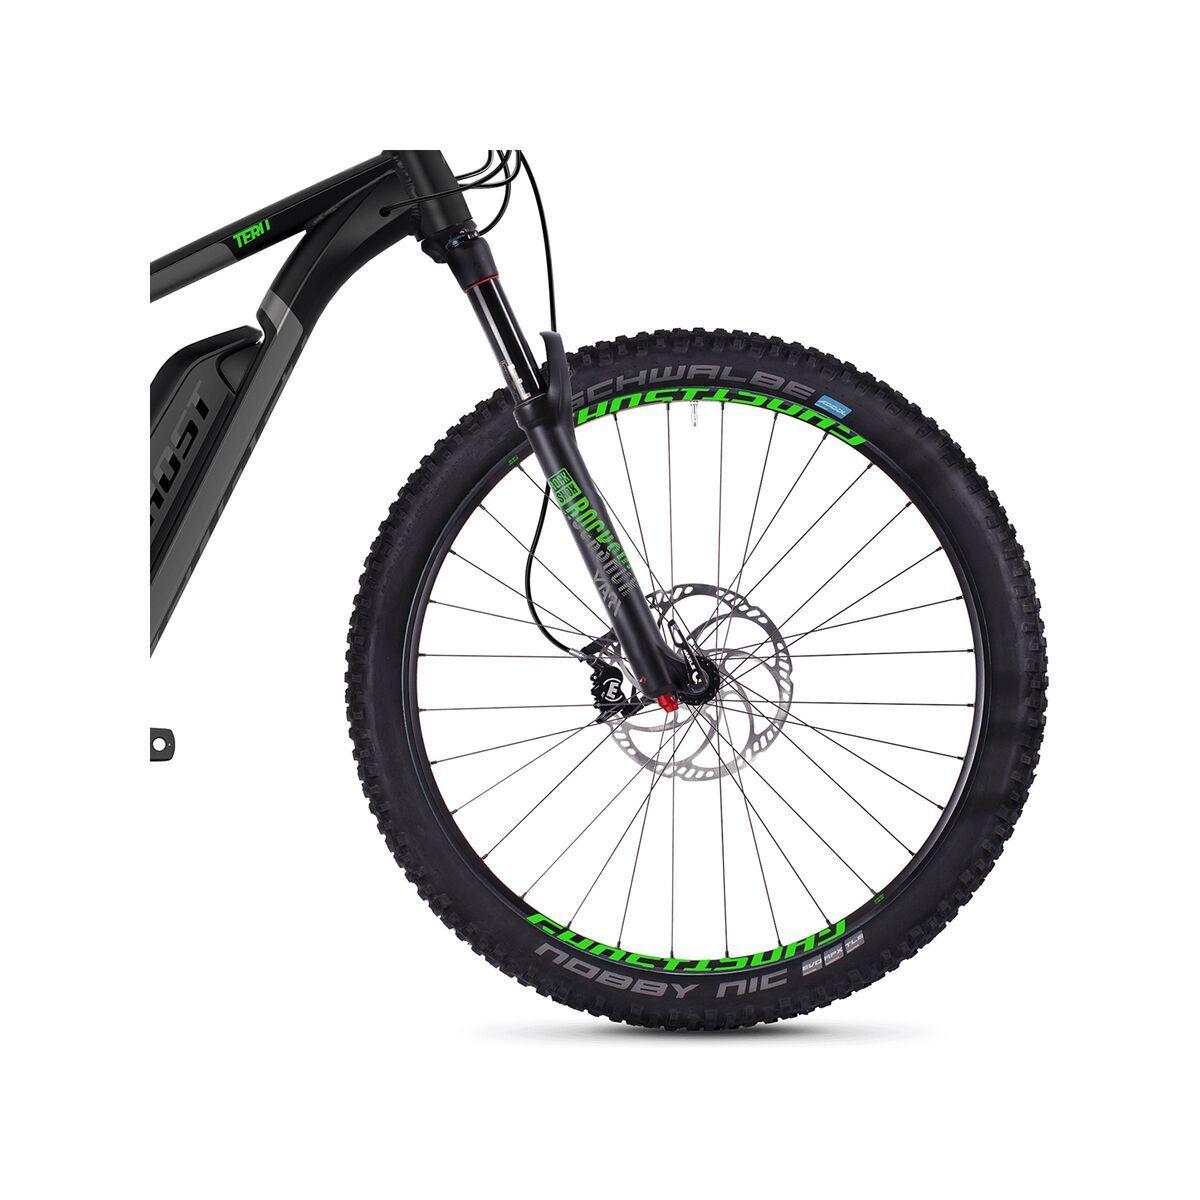 Ghost Hybride Teru B7.7+ AL, black/gray/neon green   Bild 2